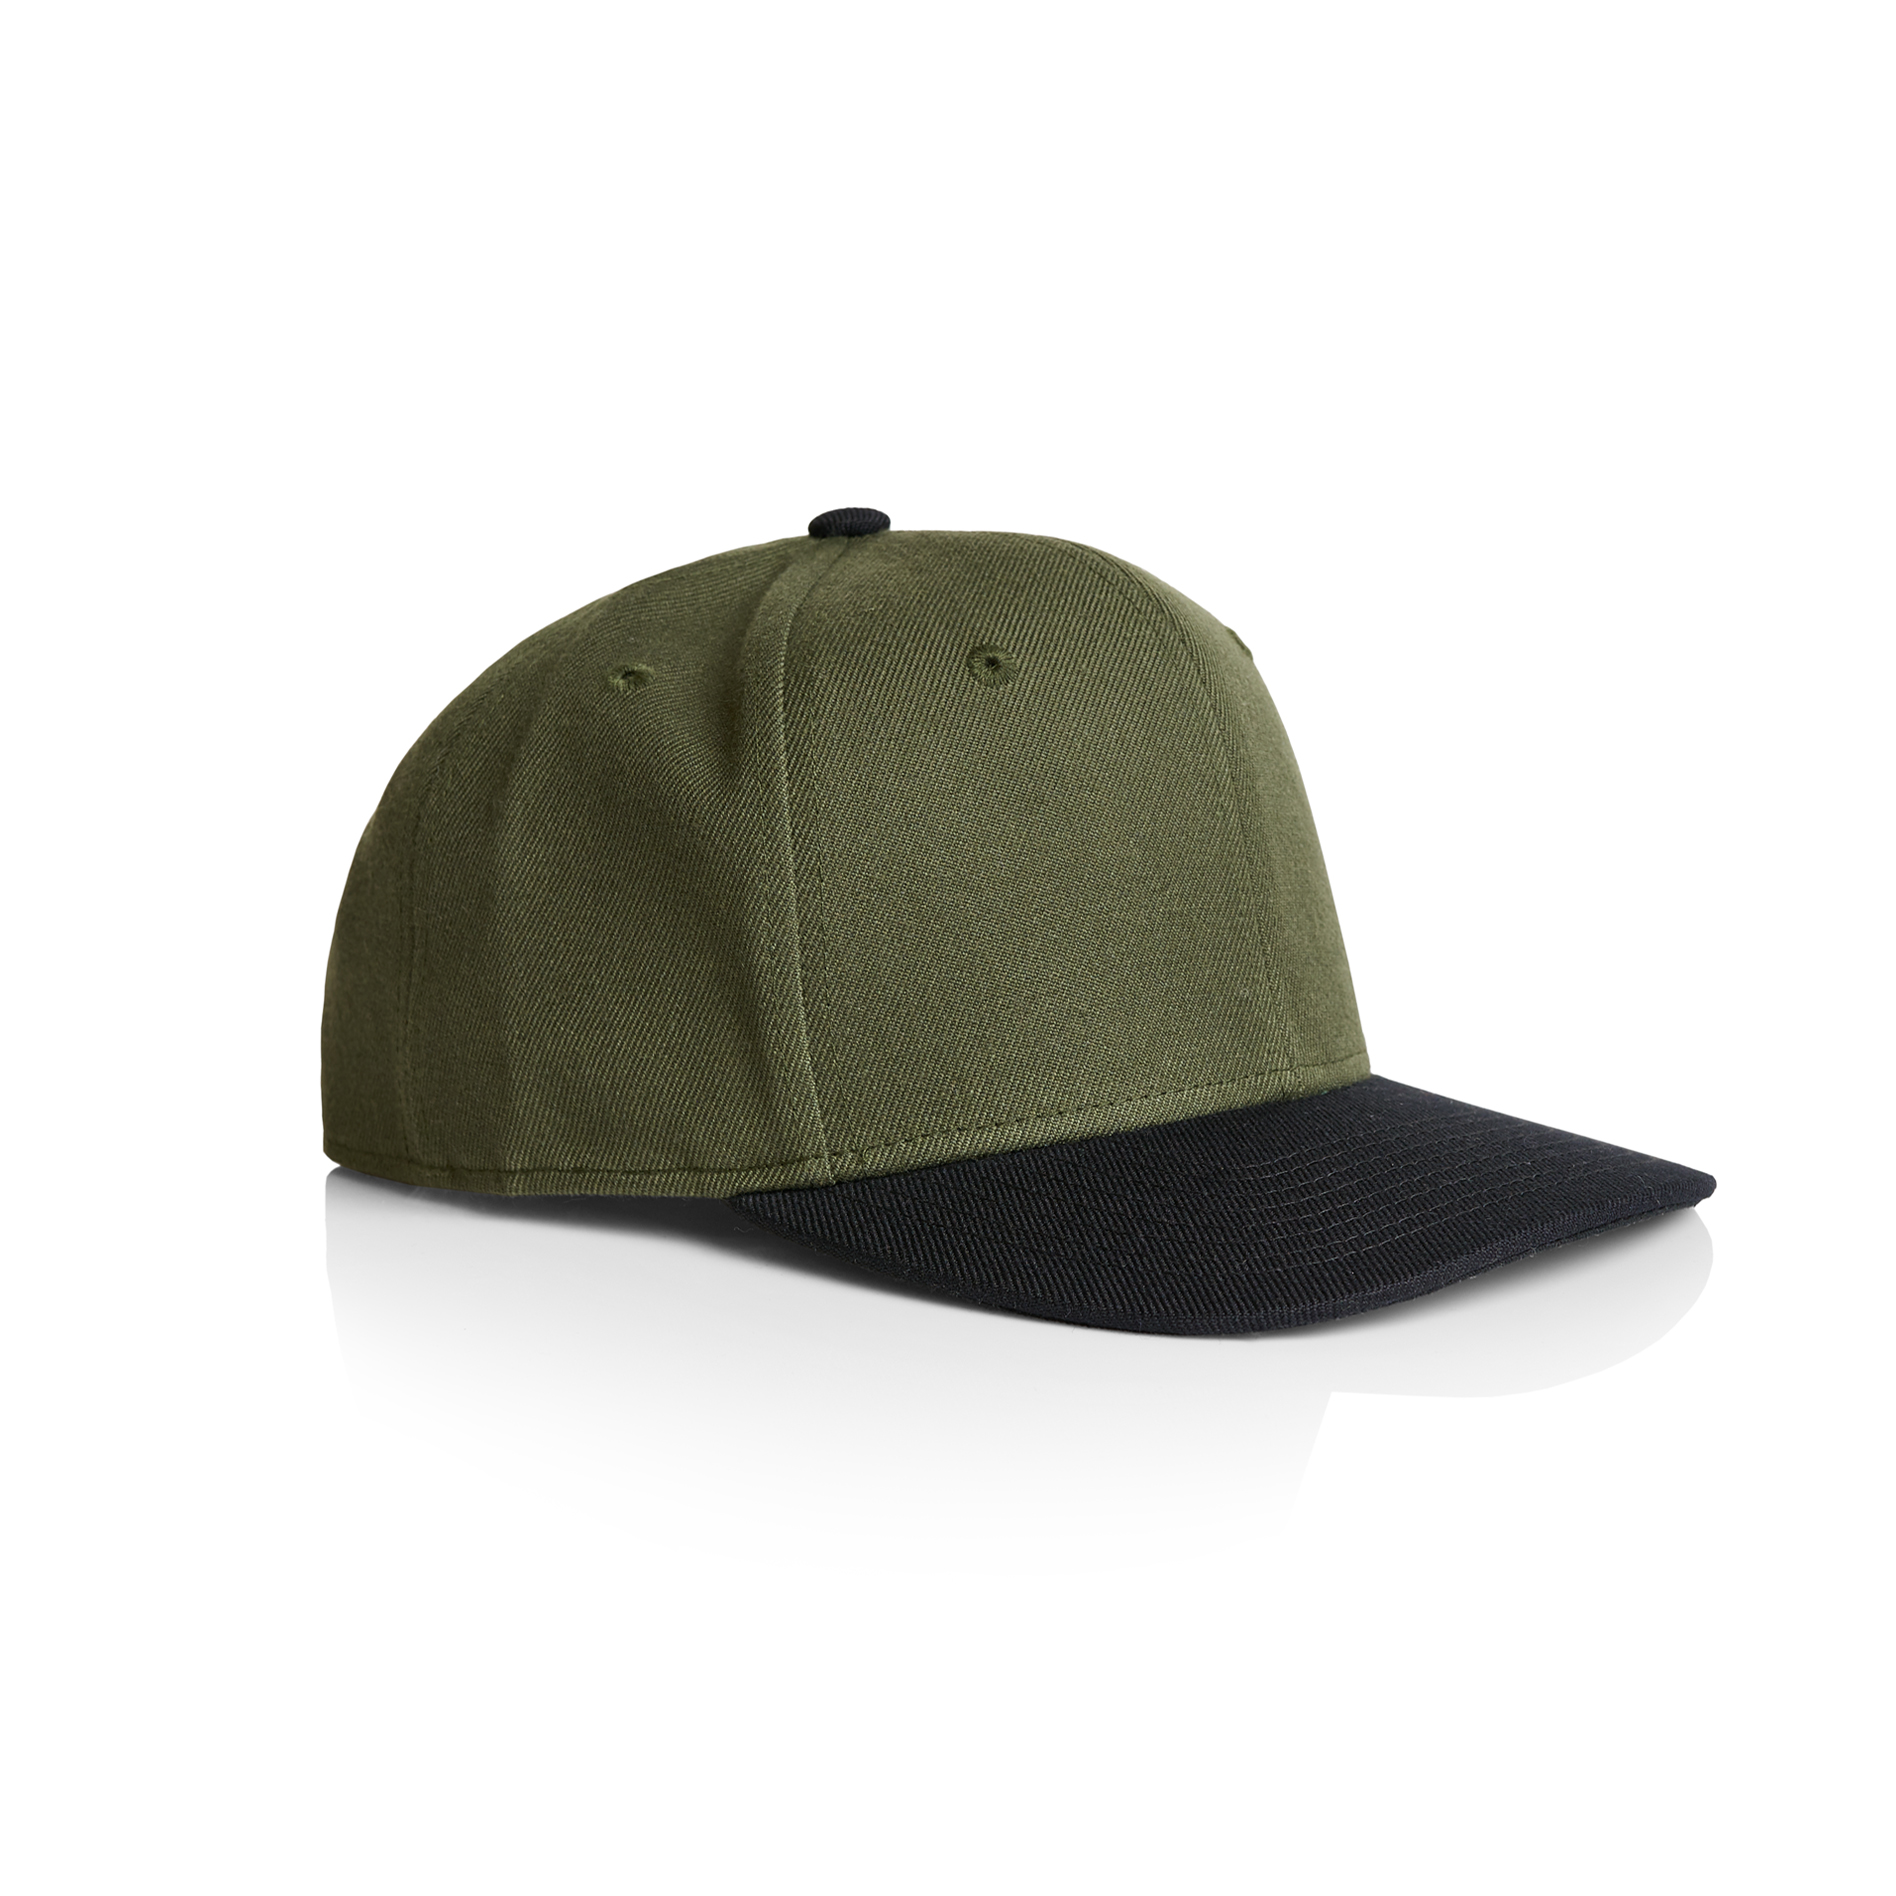 1105 FRACK SNAPBACK CAP